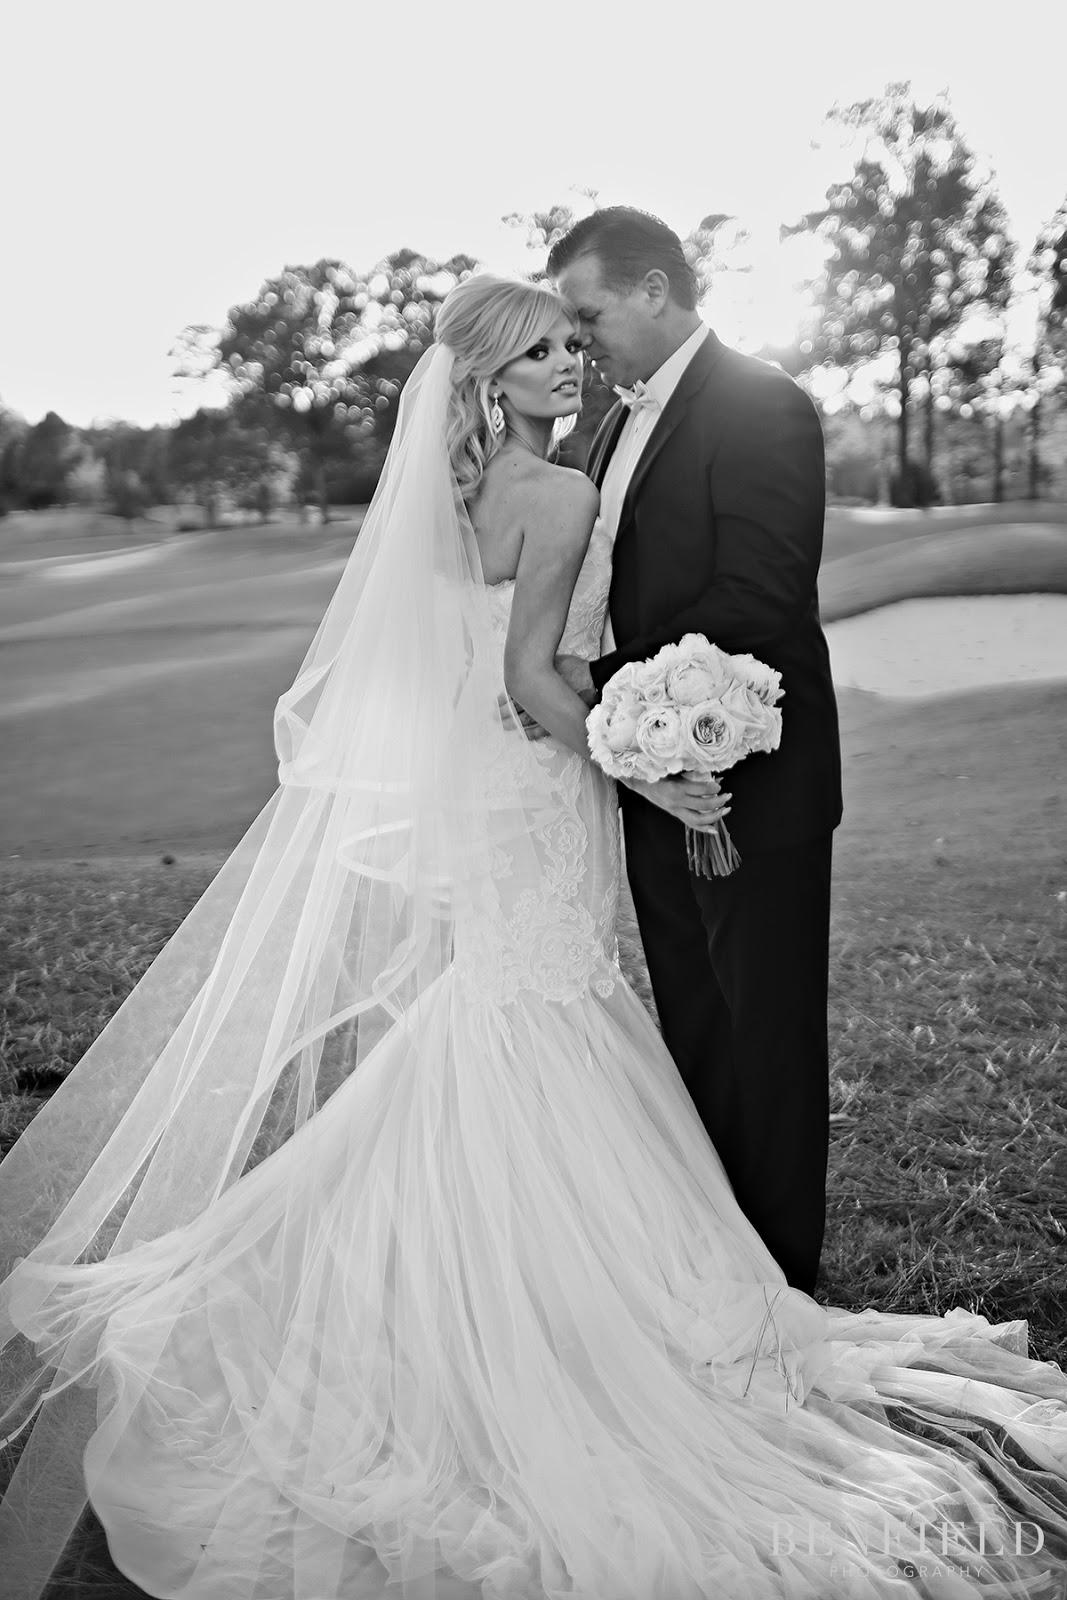 Wedding Dresses In Little Rock Ar 19 Vintage Talk to you soon